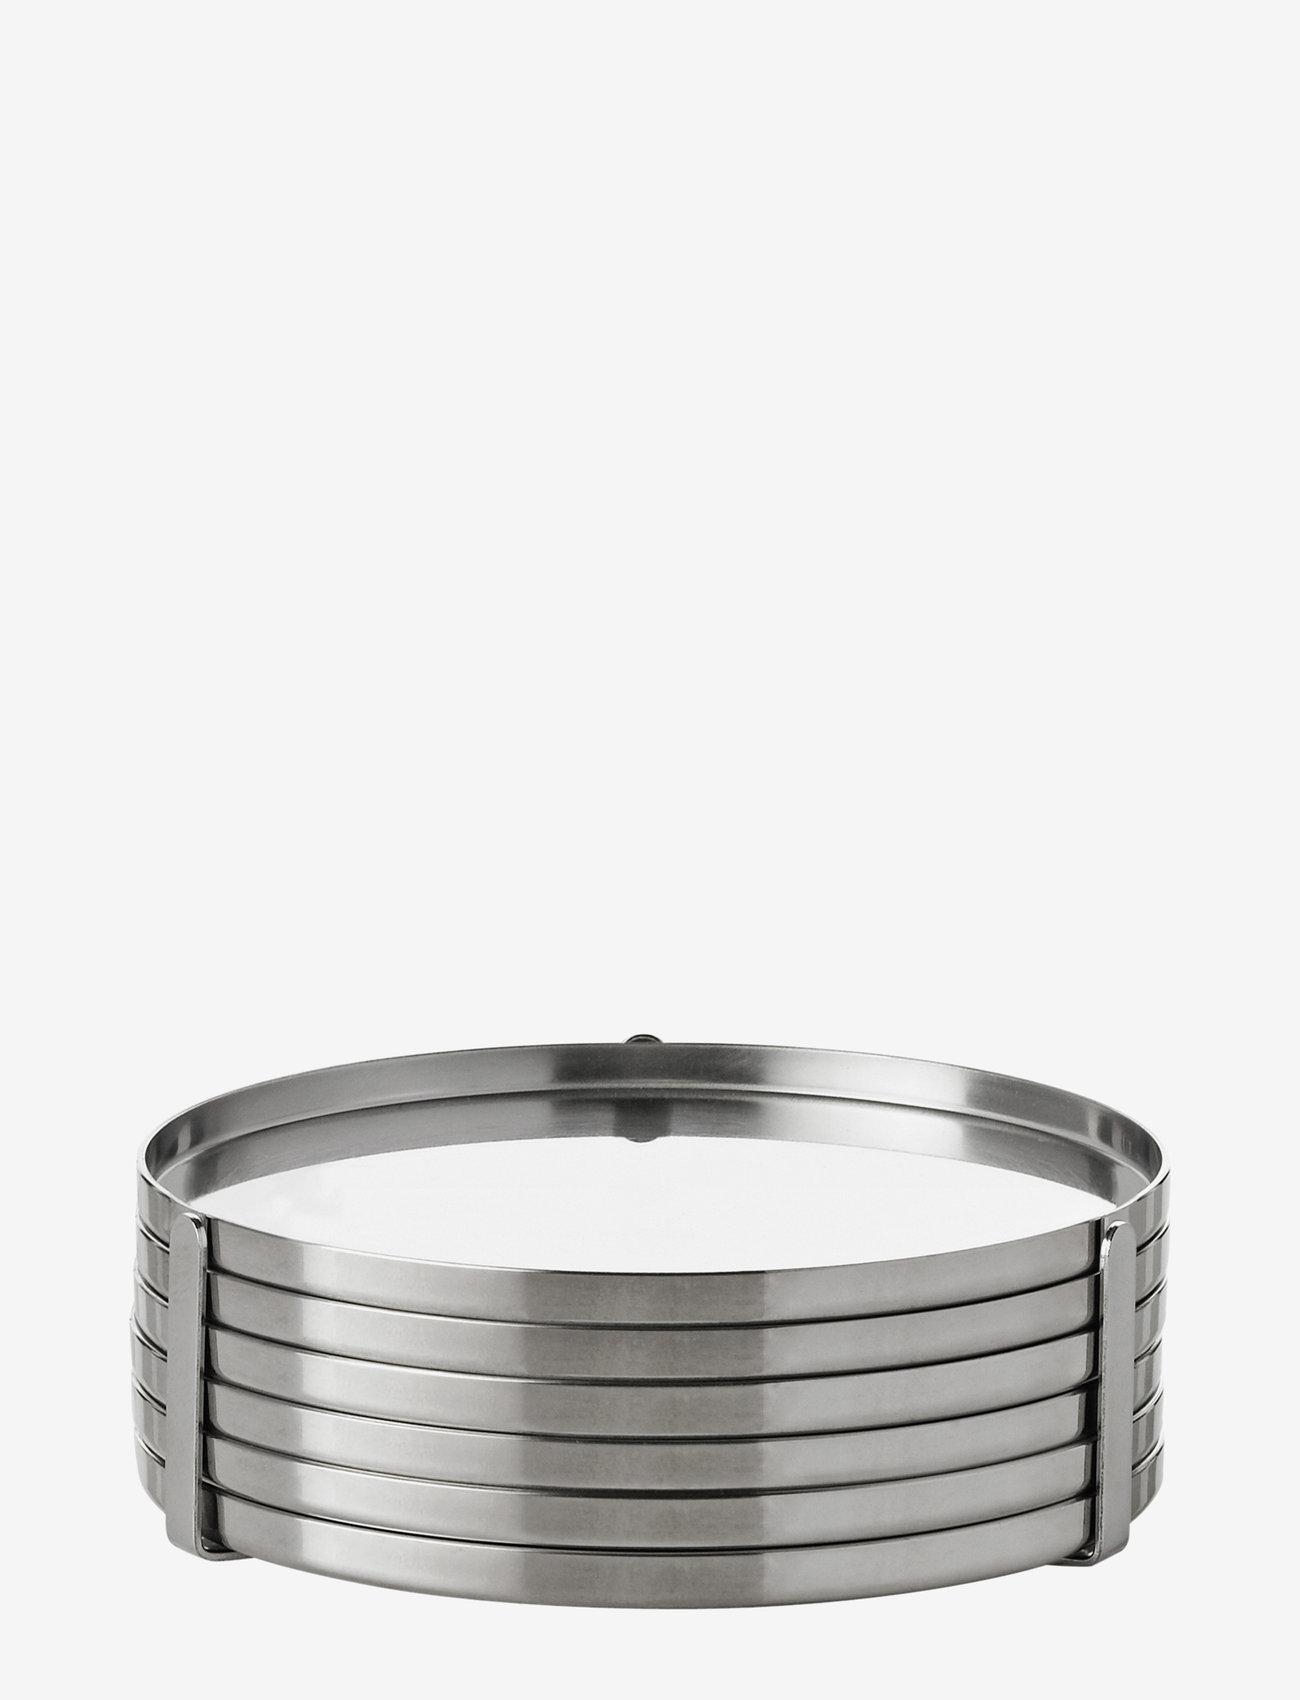 Stelton - AJ coaster - 6 pcs - steel - 0